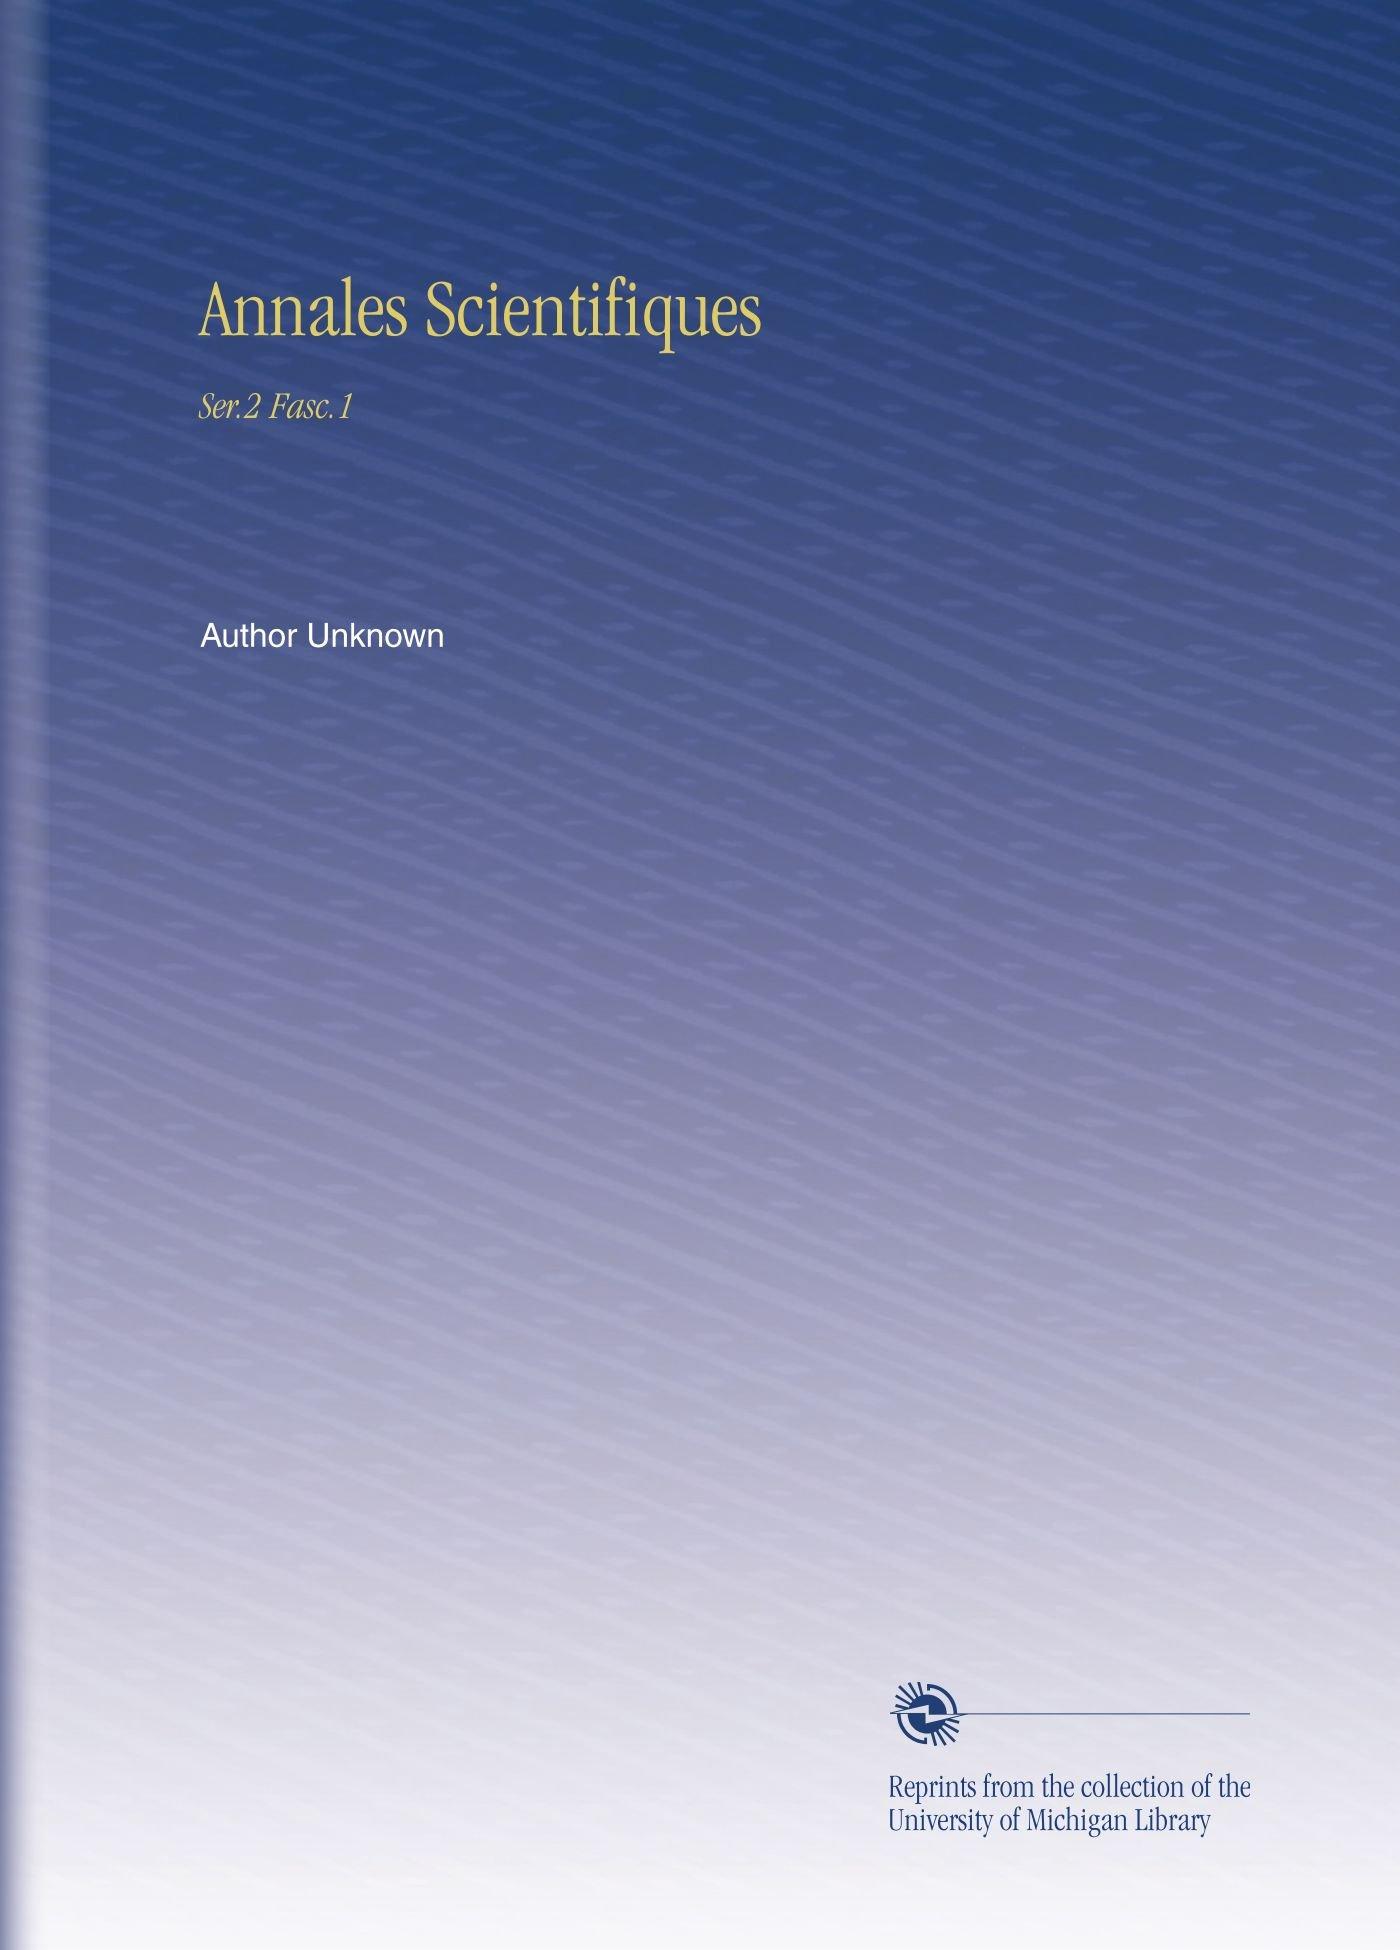 Download Annales Scientifiques: Ser.2 Fasc.1 (French Edition) ebook